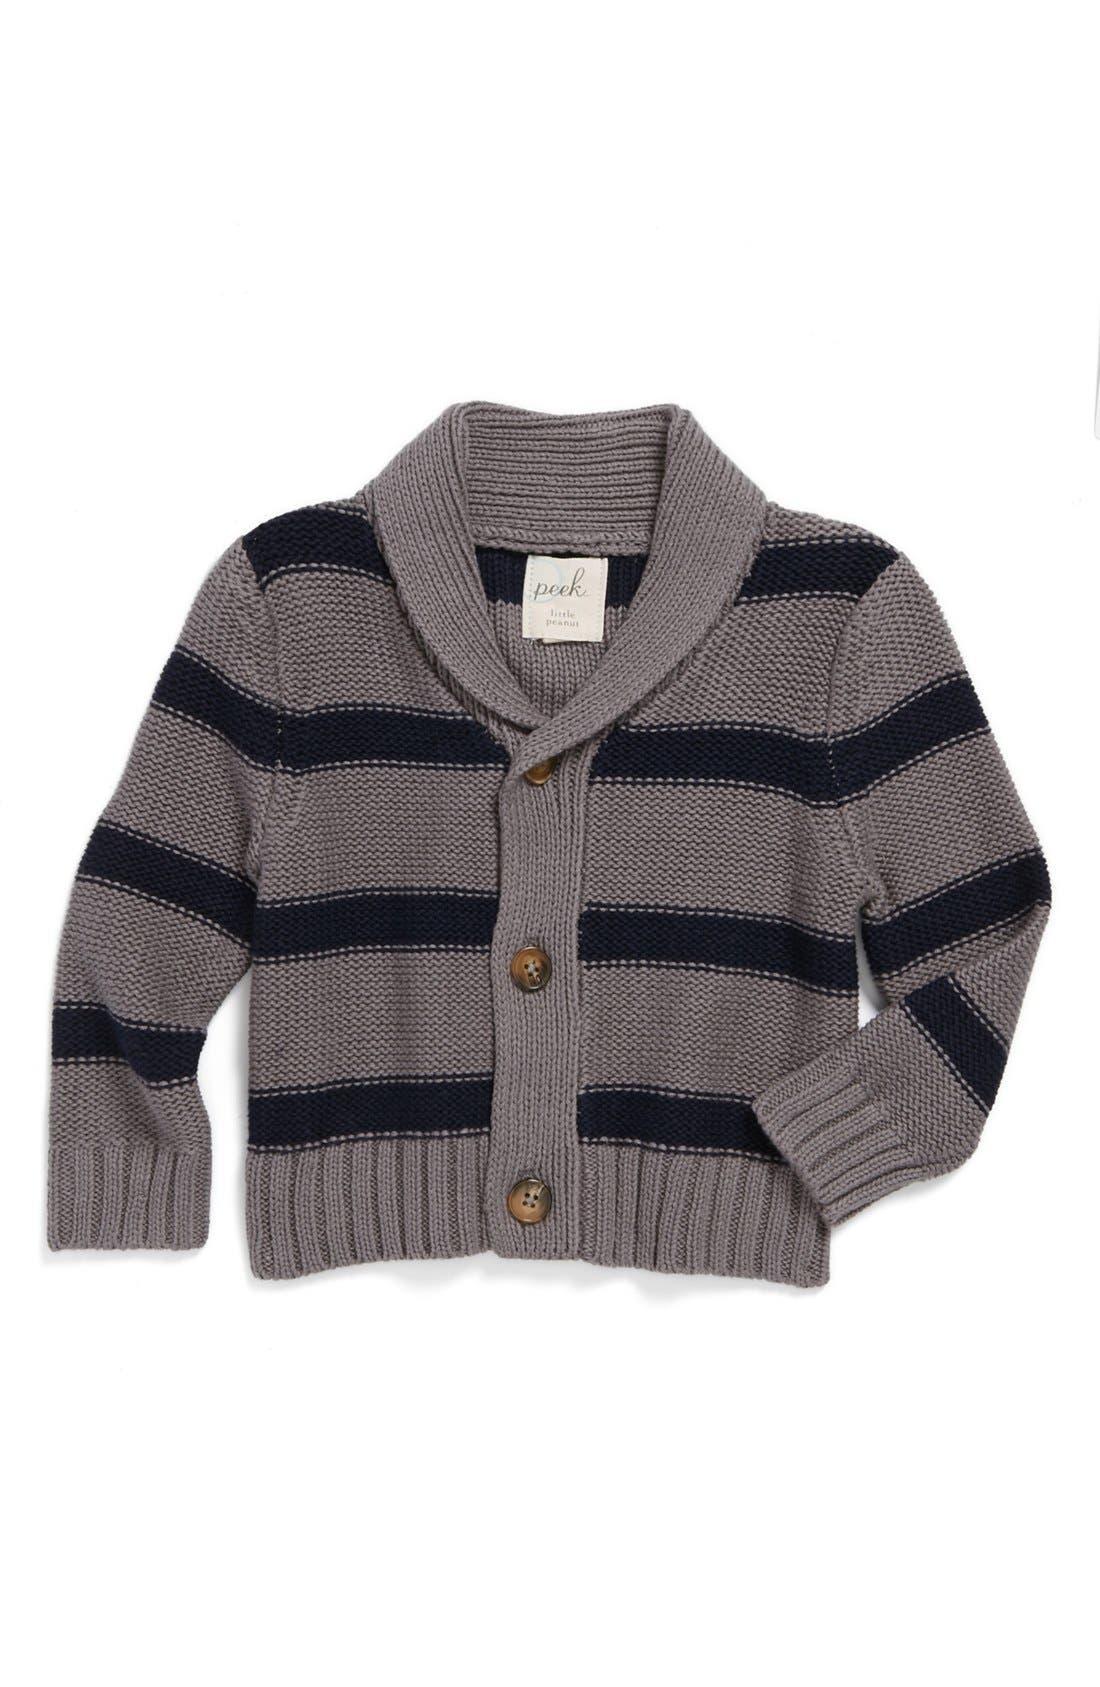 Main Image - Peek 'Highland' Stripe Cardigan (Baby Boys)